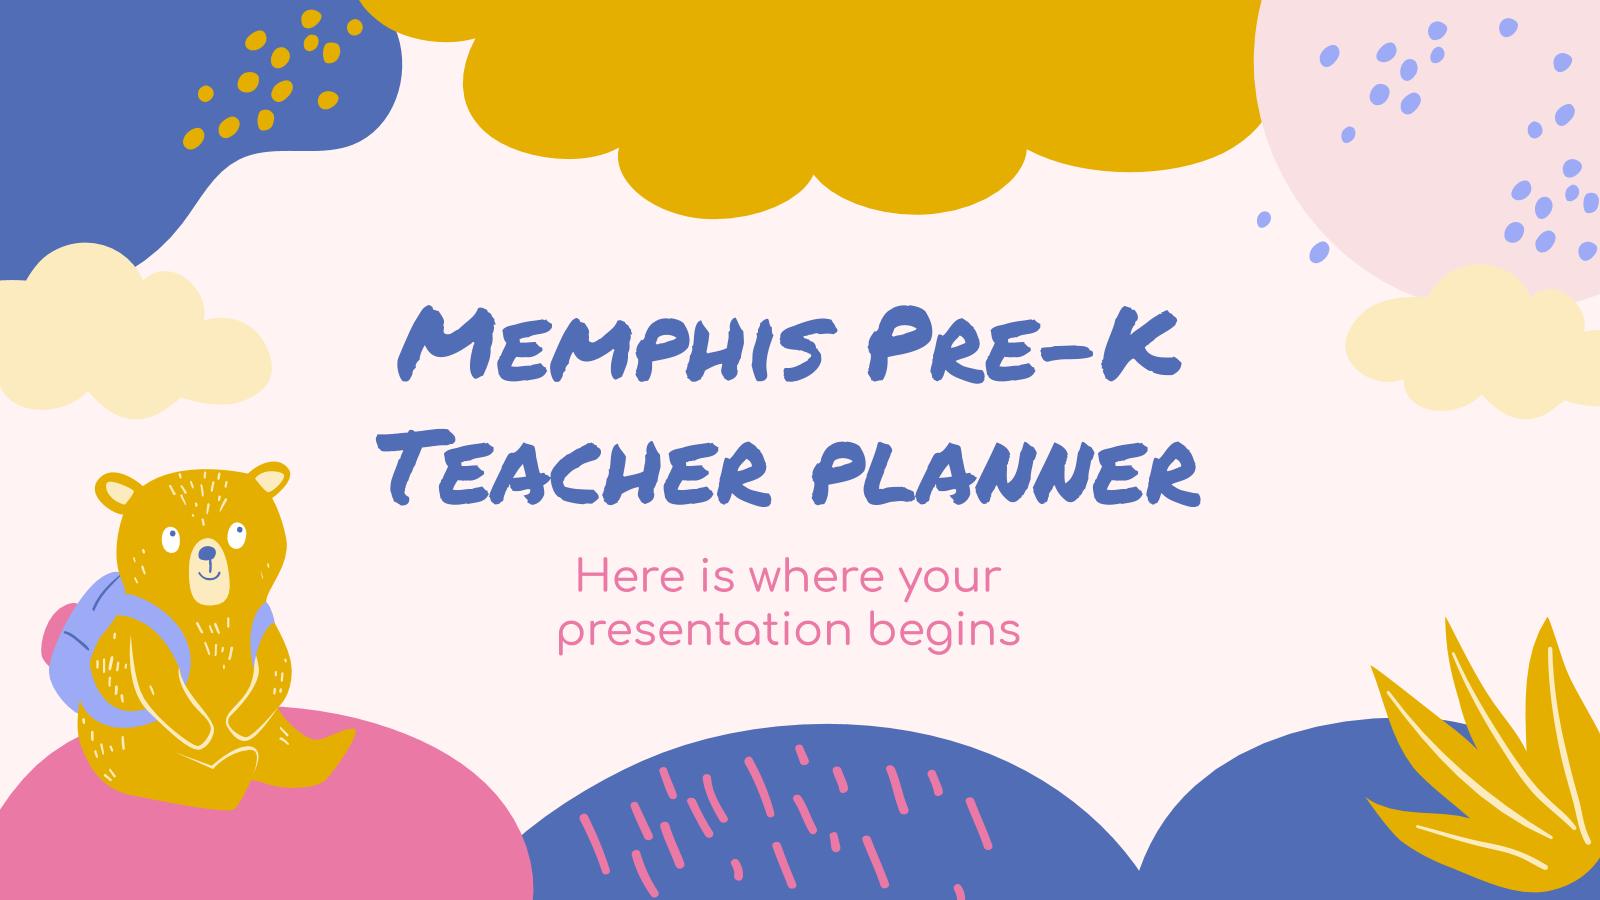 Memphis Pre-K Teacher Planner presentation template